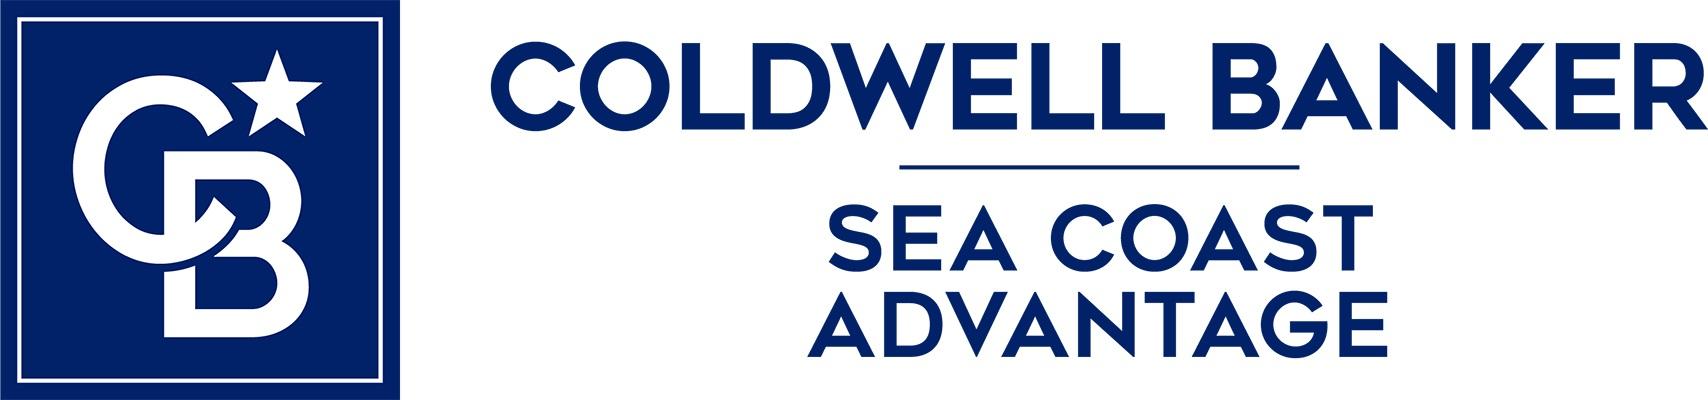 Shanon Ives - Coldwell Banker Sea Coast Advantage Realty Logo